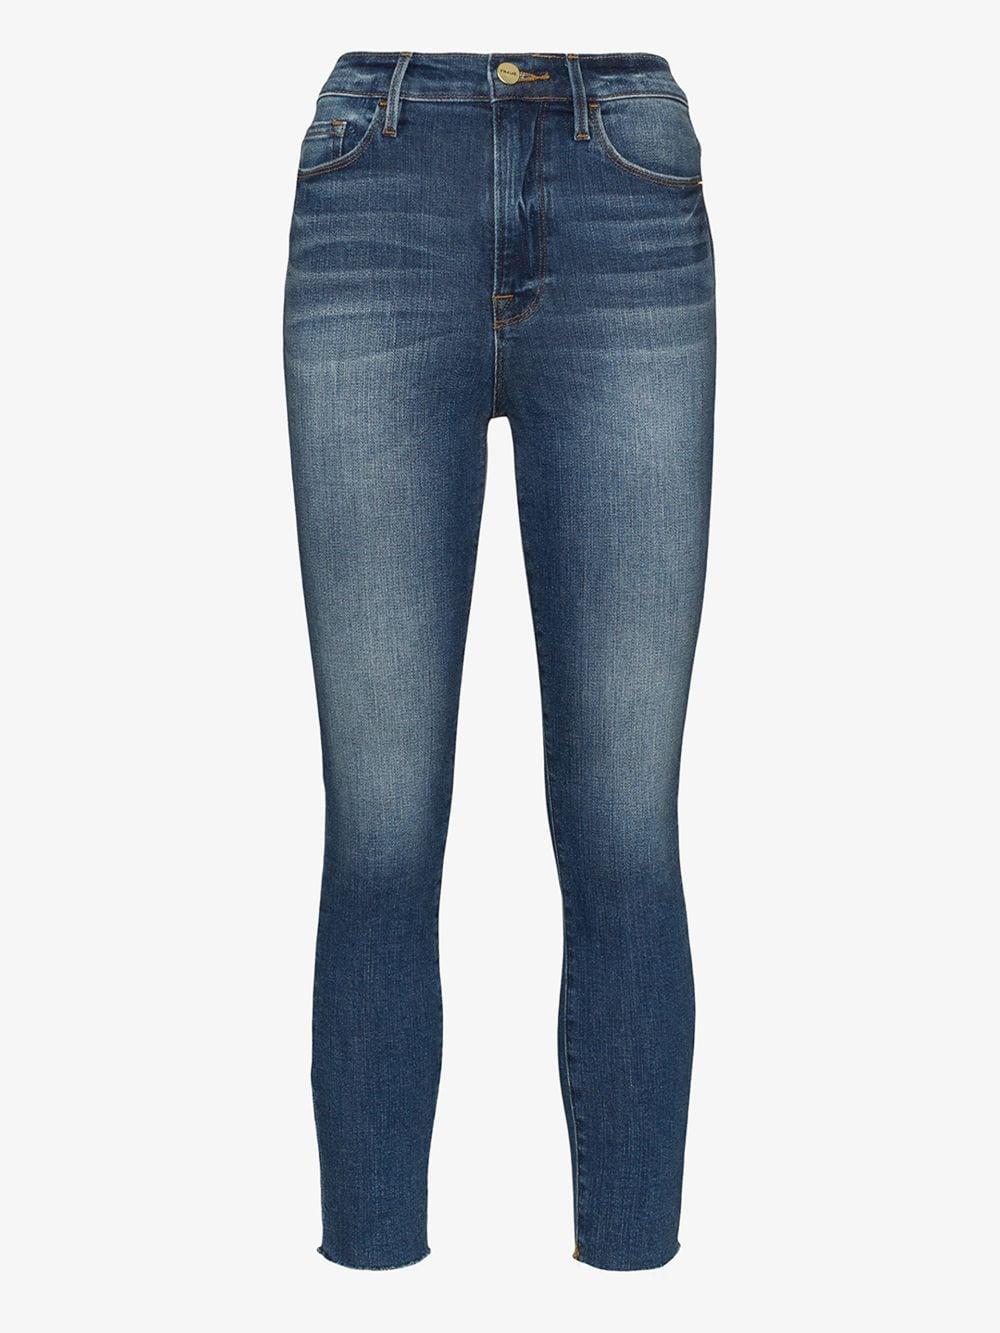 FRAME DENIM Jeans FRAME DENIM | Jeans | AHRSCRA793LUPN